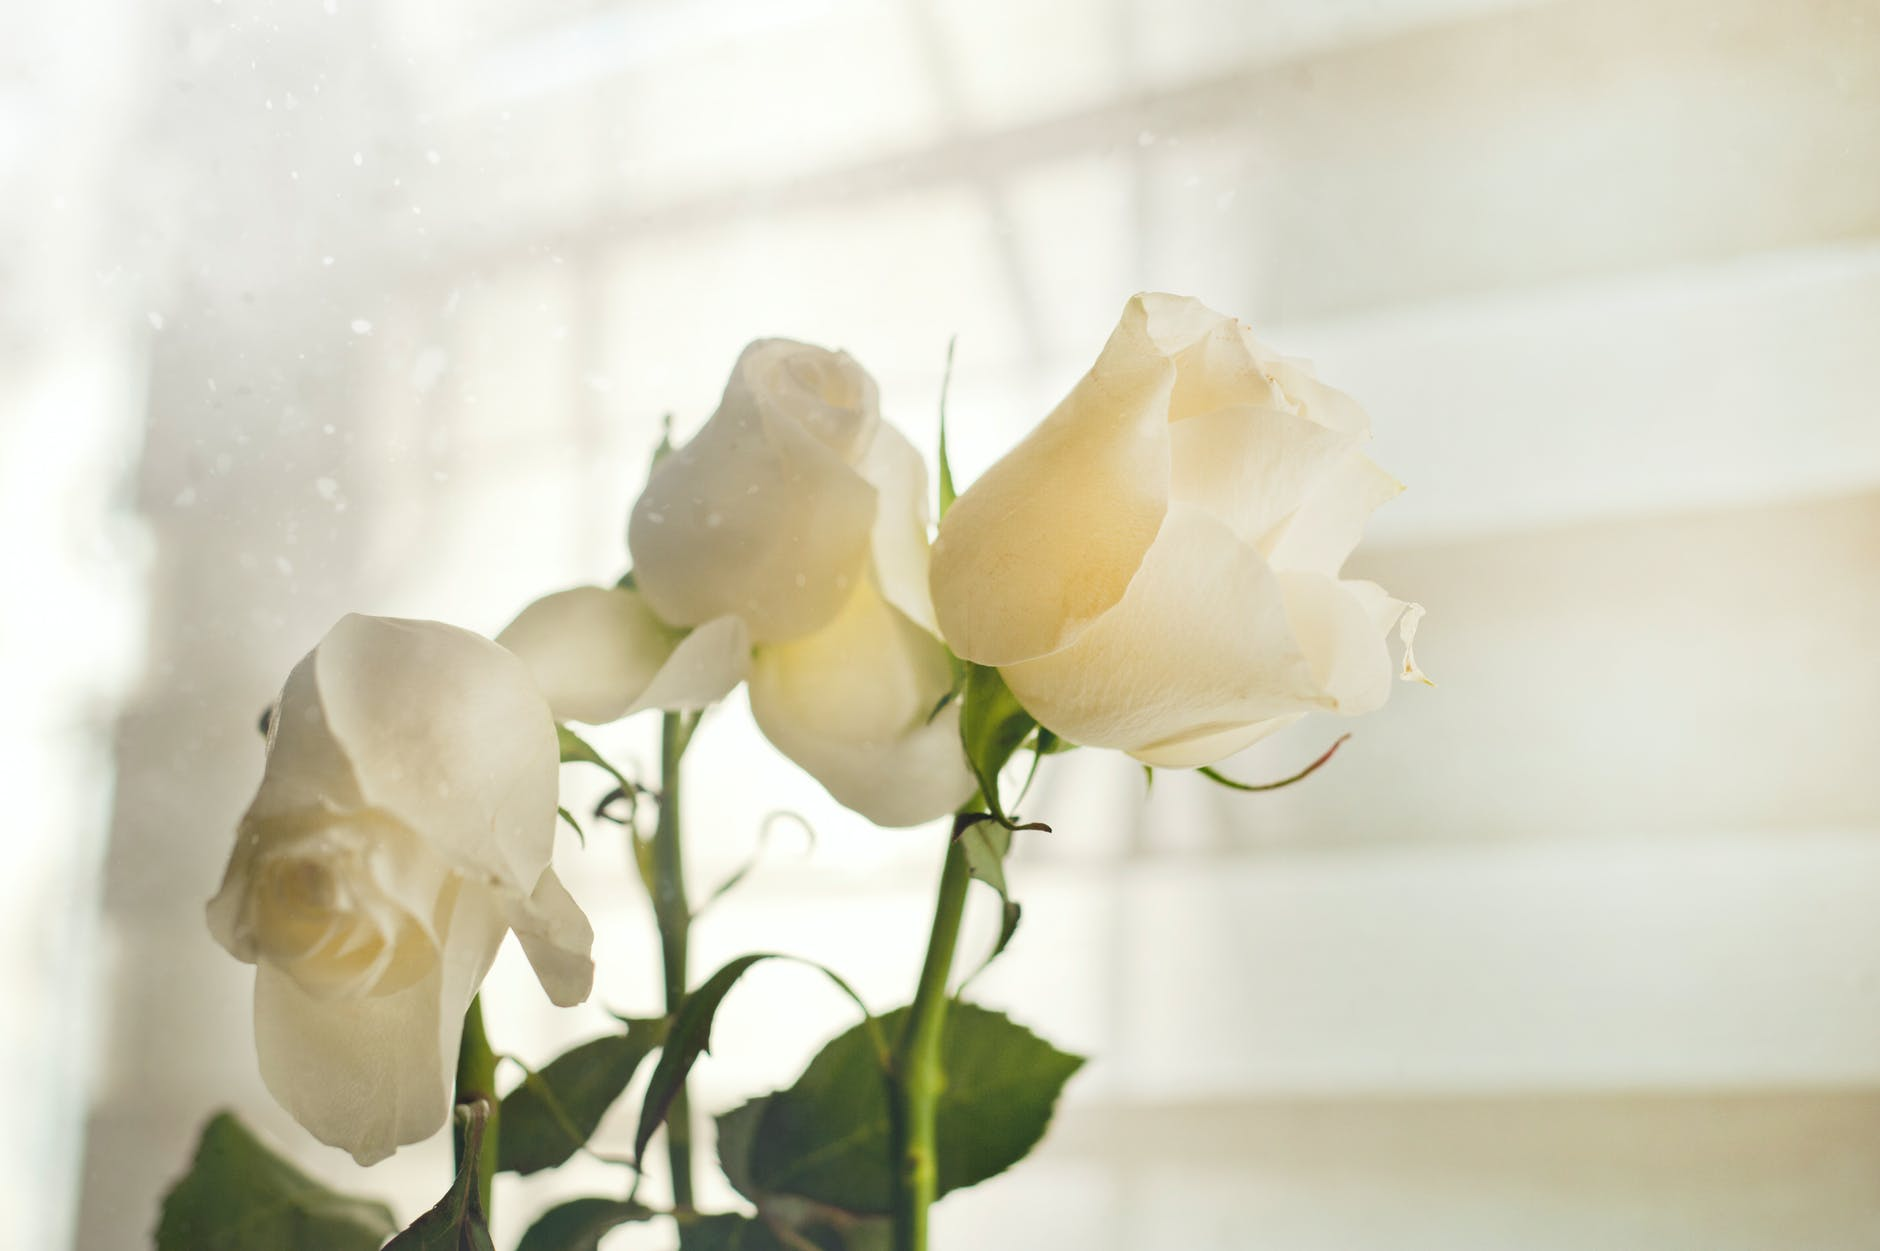 gambar bunga mawar putih yang sangat cantik